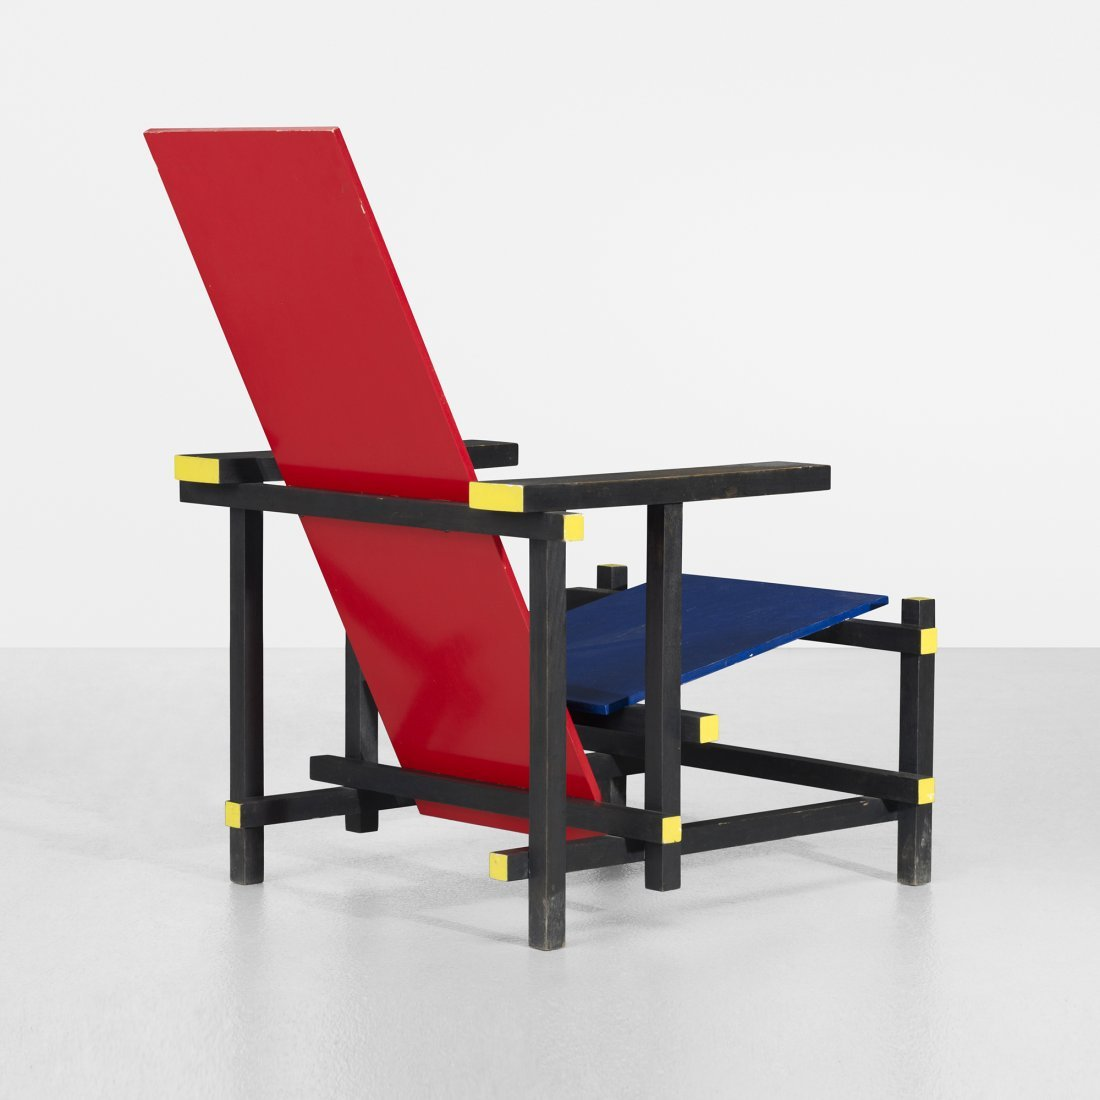 Rietveld Stuhl gerrit rietveld furniture gerrit rietveld zig zag chair a